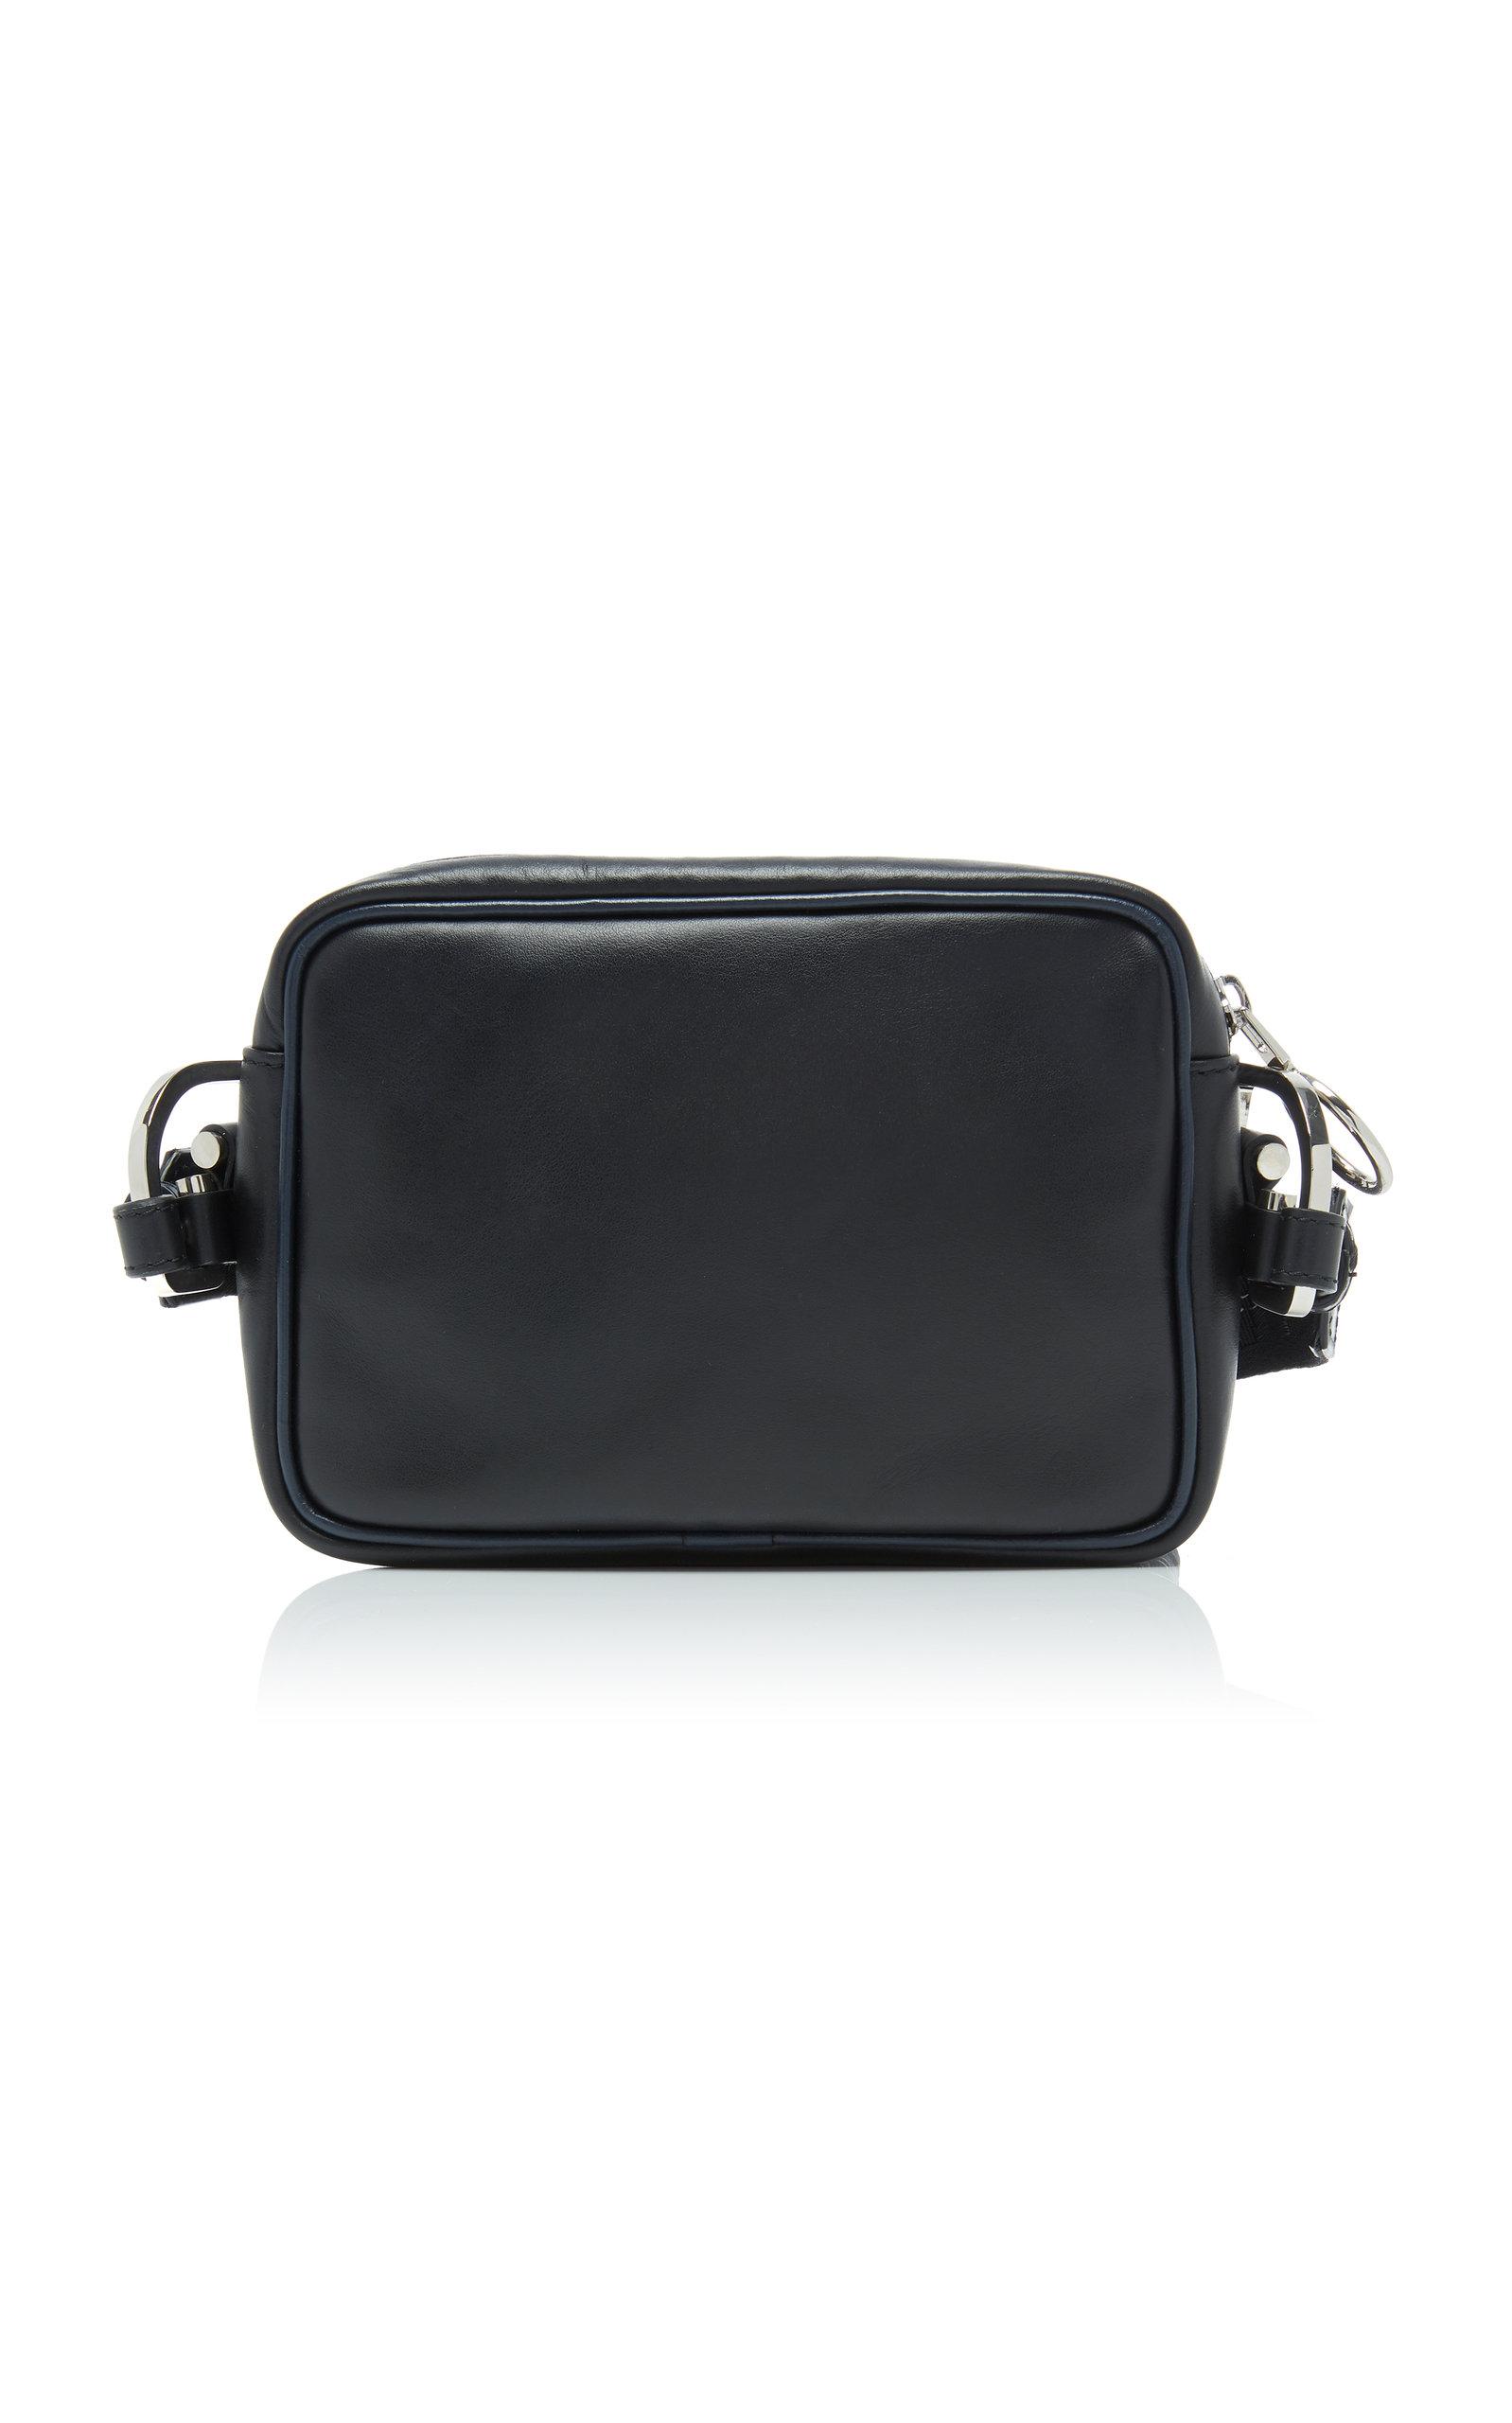 06bdc37bde Off-White c o Virgil AblohPrinted Leather Crossbody Bag